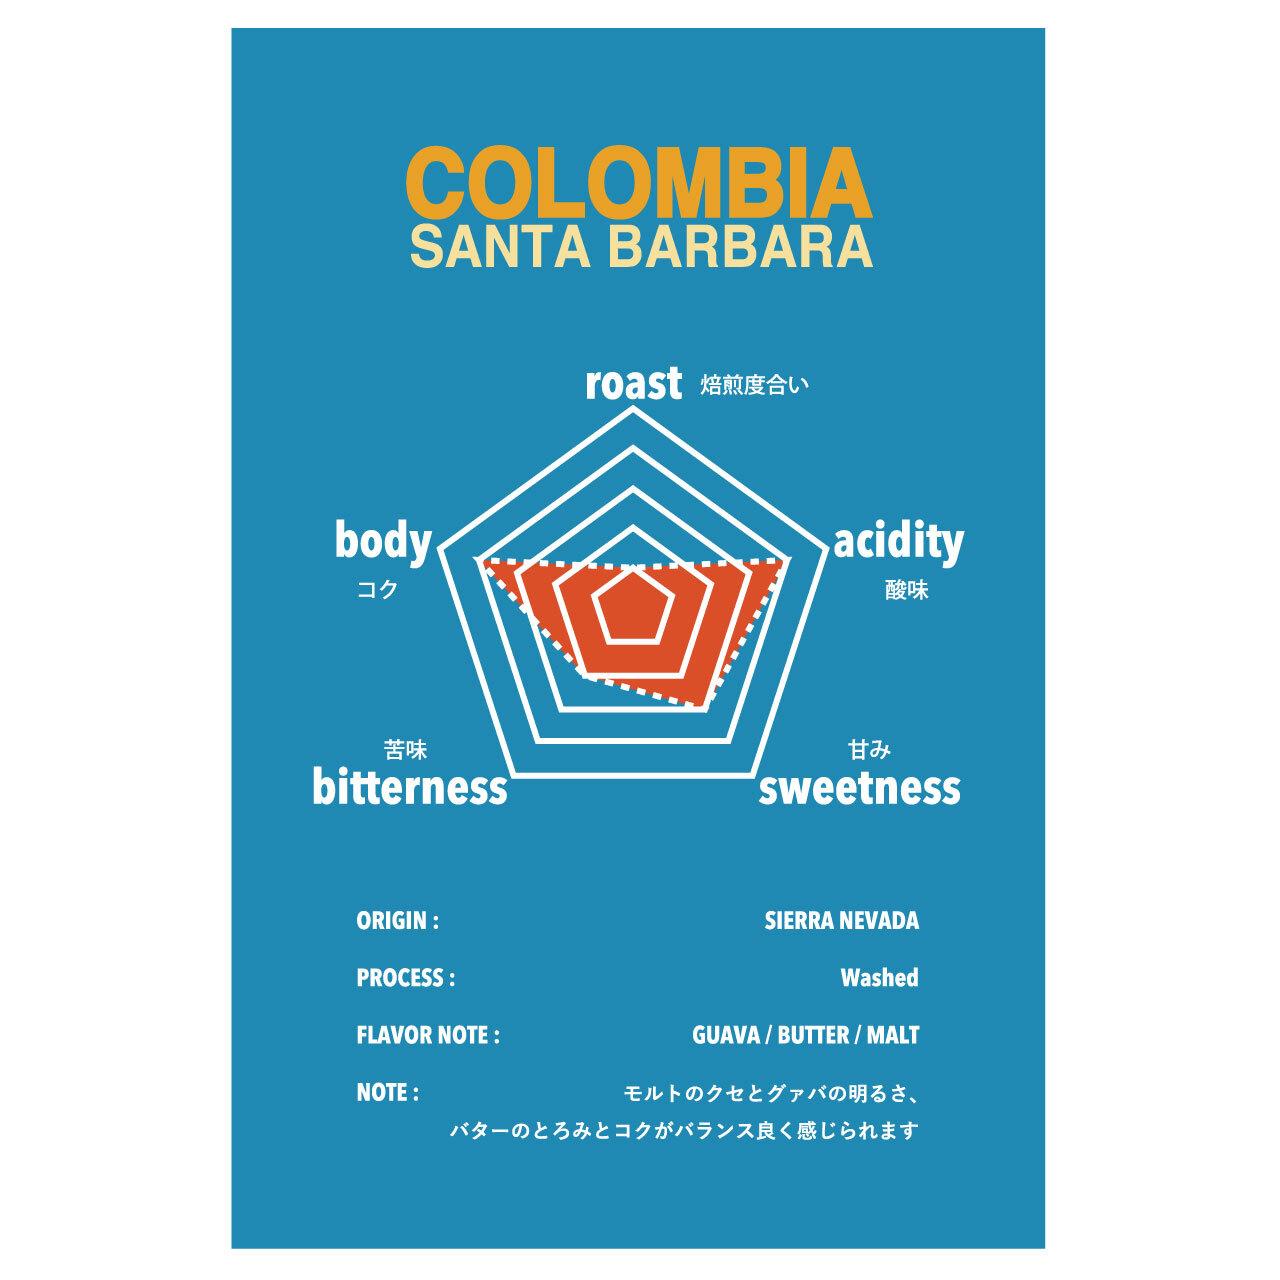 Colombia Santa Barbara 2kg 袋入 (Online SHOP・難波店限定)